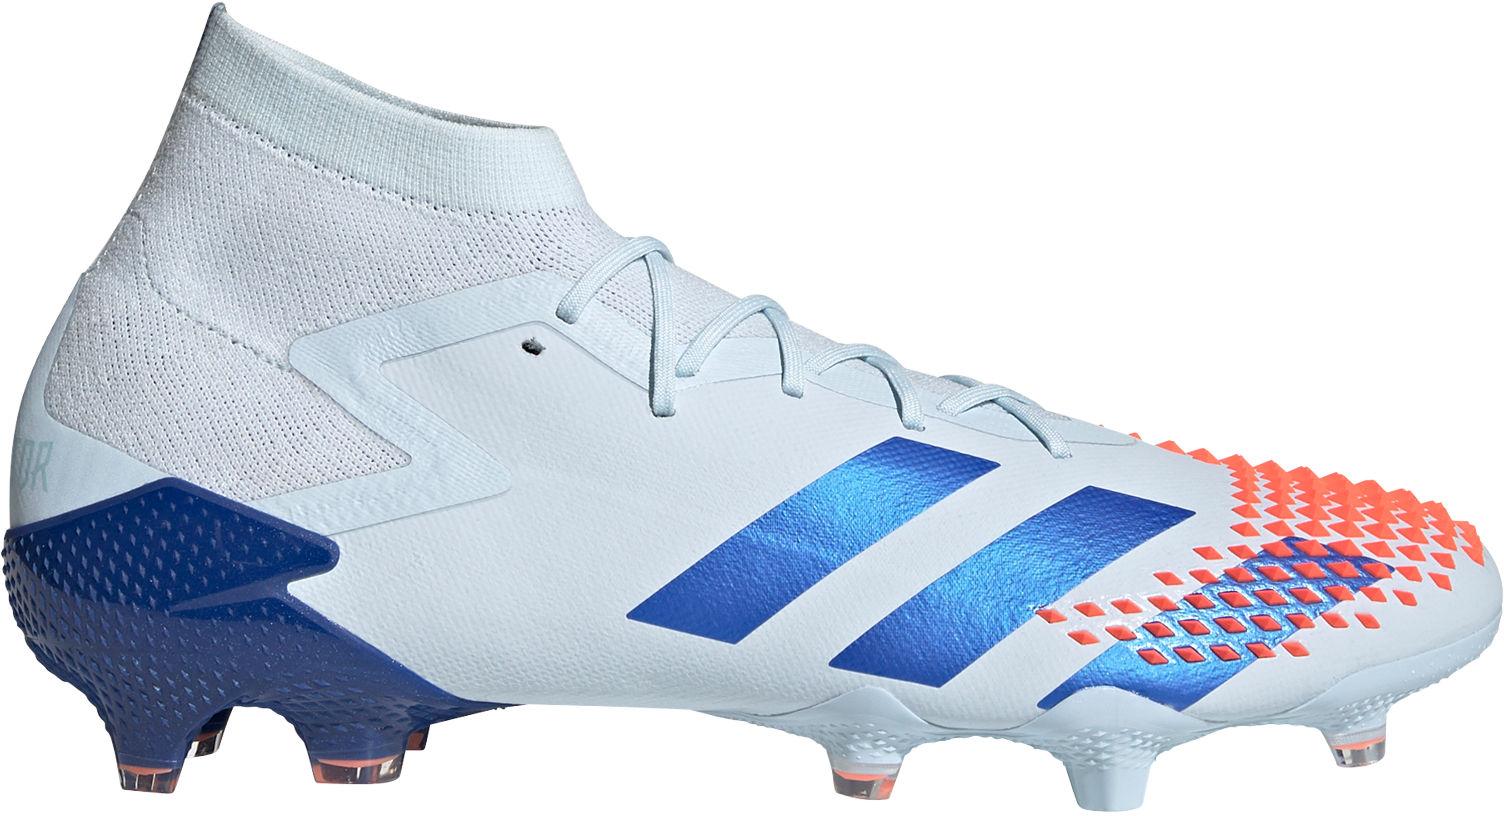 Kopačky adidas PREDATOR MUTATOR 20.1 FG modrá